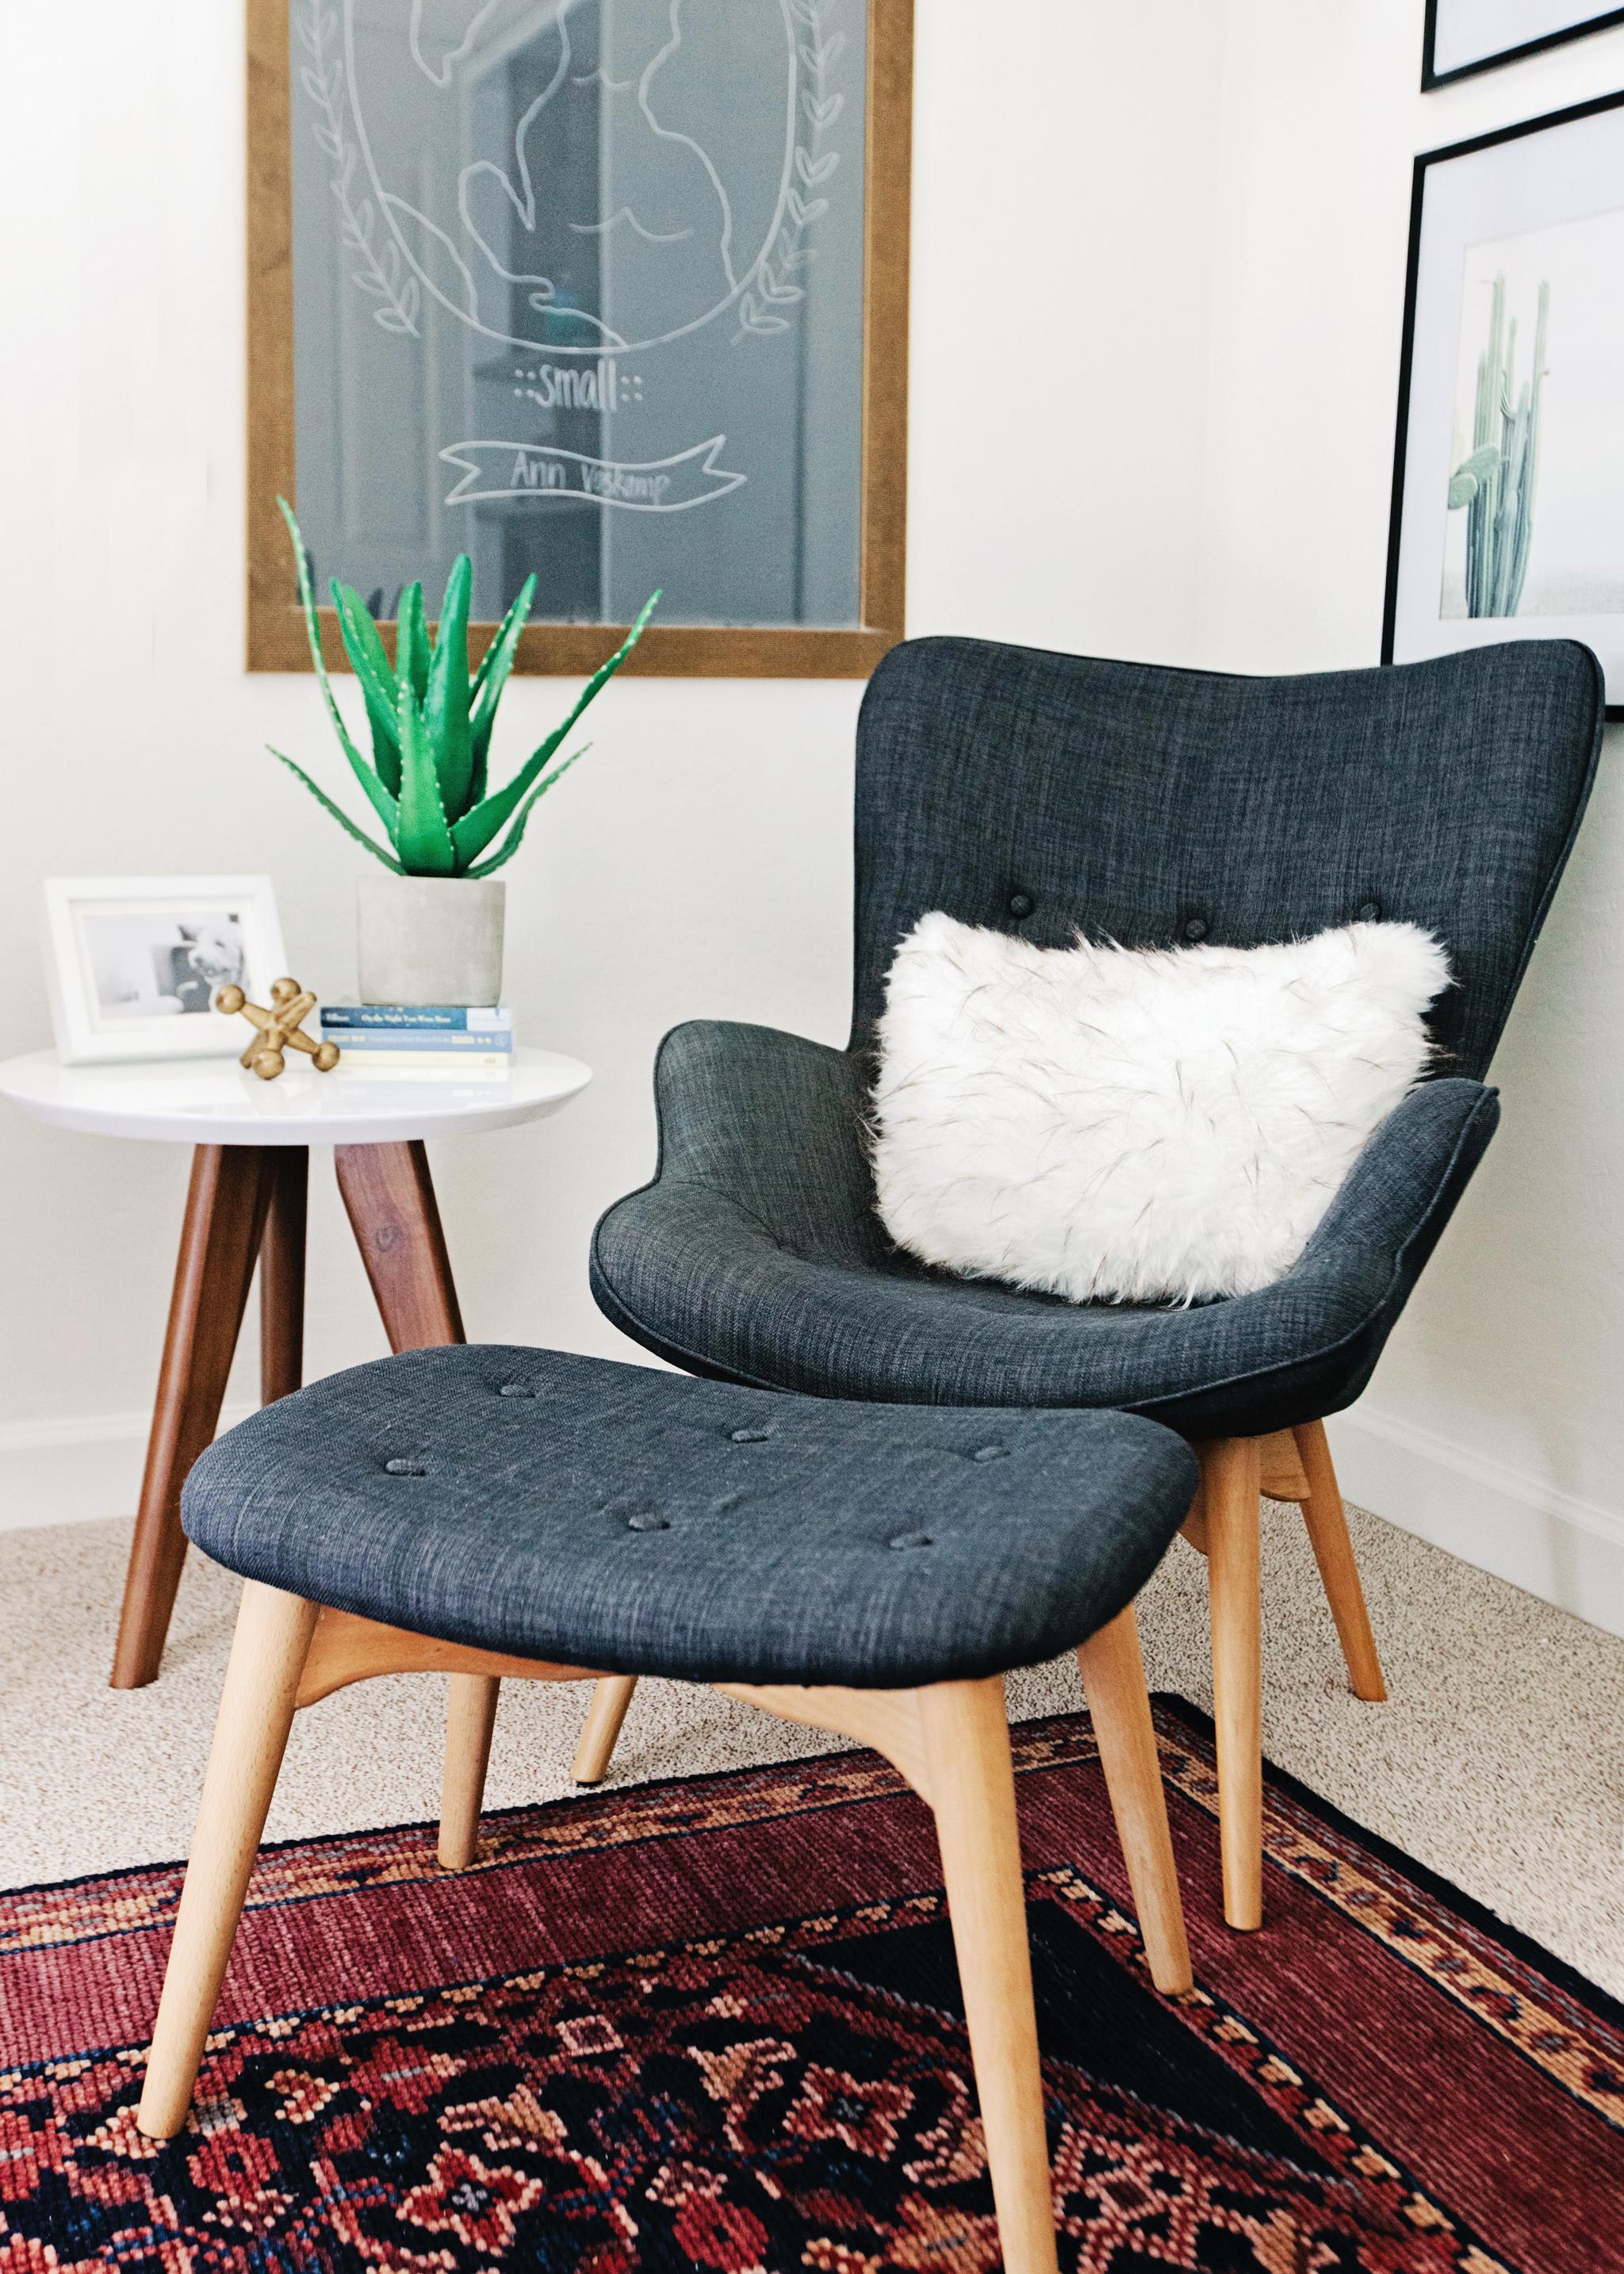 Magnificent Alexandra Evjen Nursery Reveal Living Room Chairs Home Ibusinesslaw Wood Chair Design Ideas Ibusinesslaworg